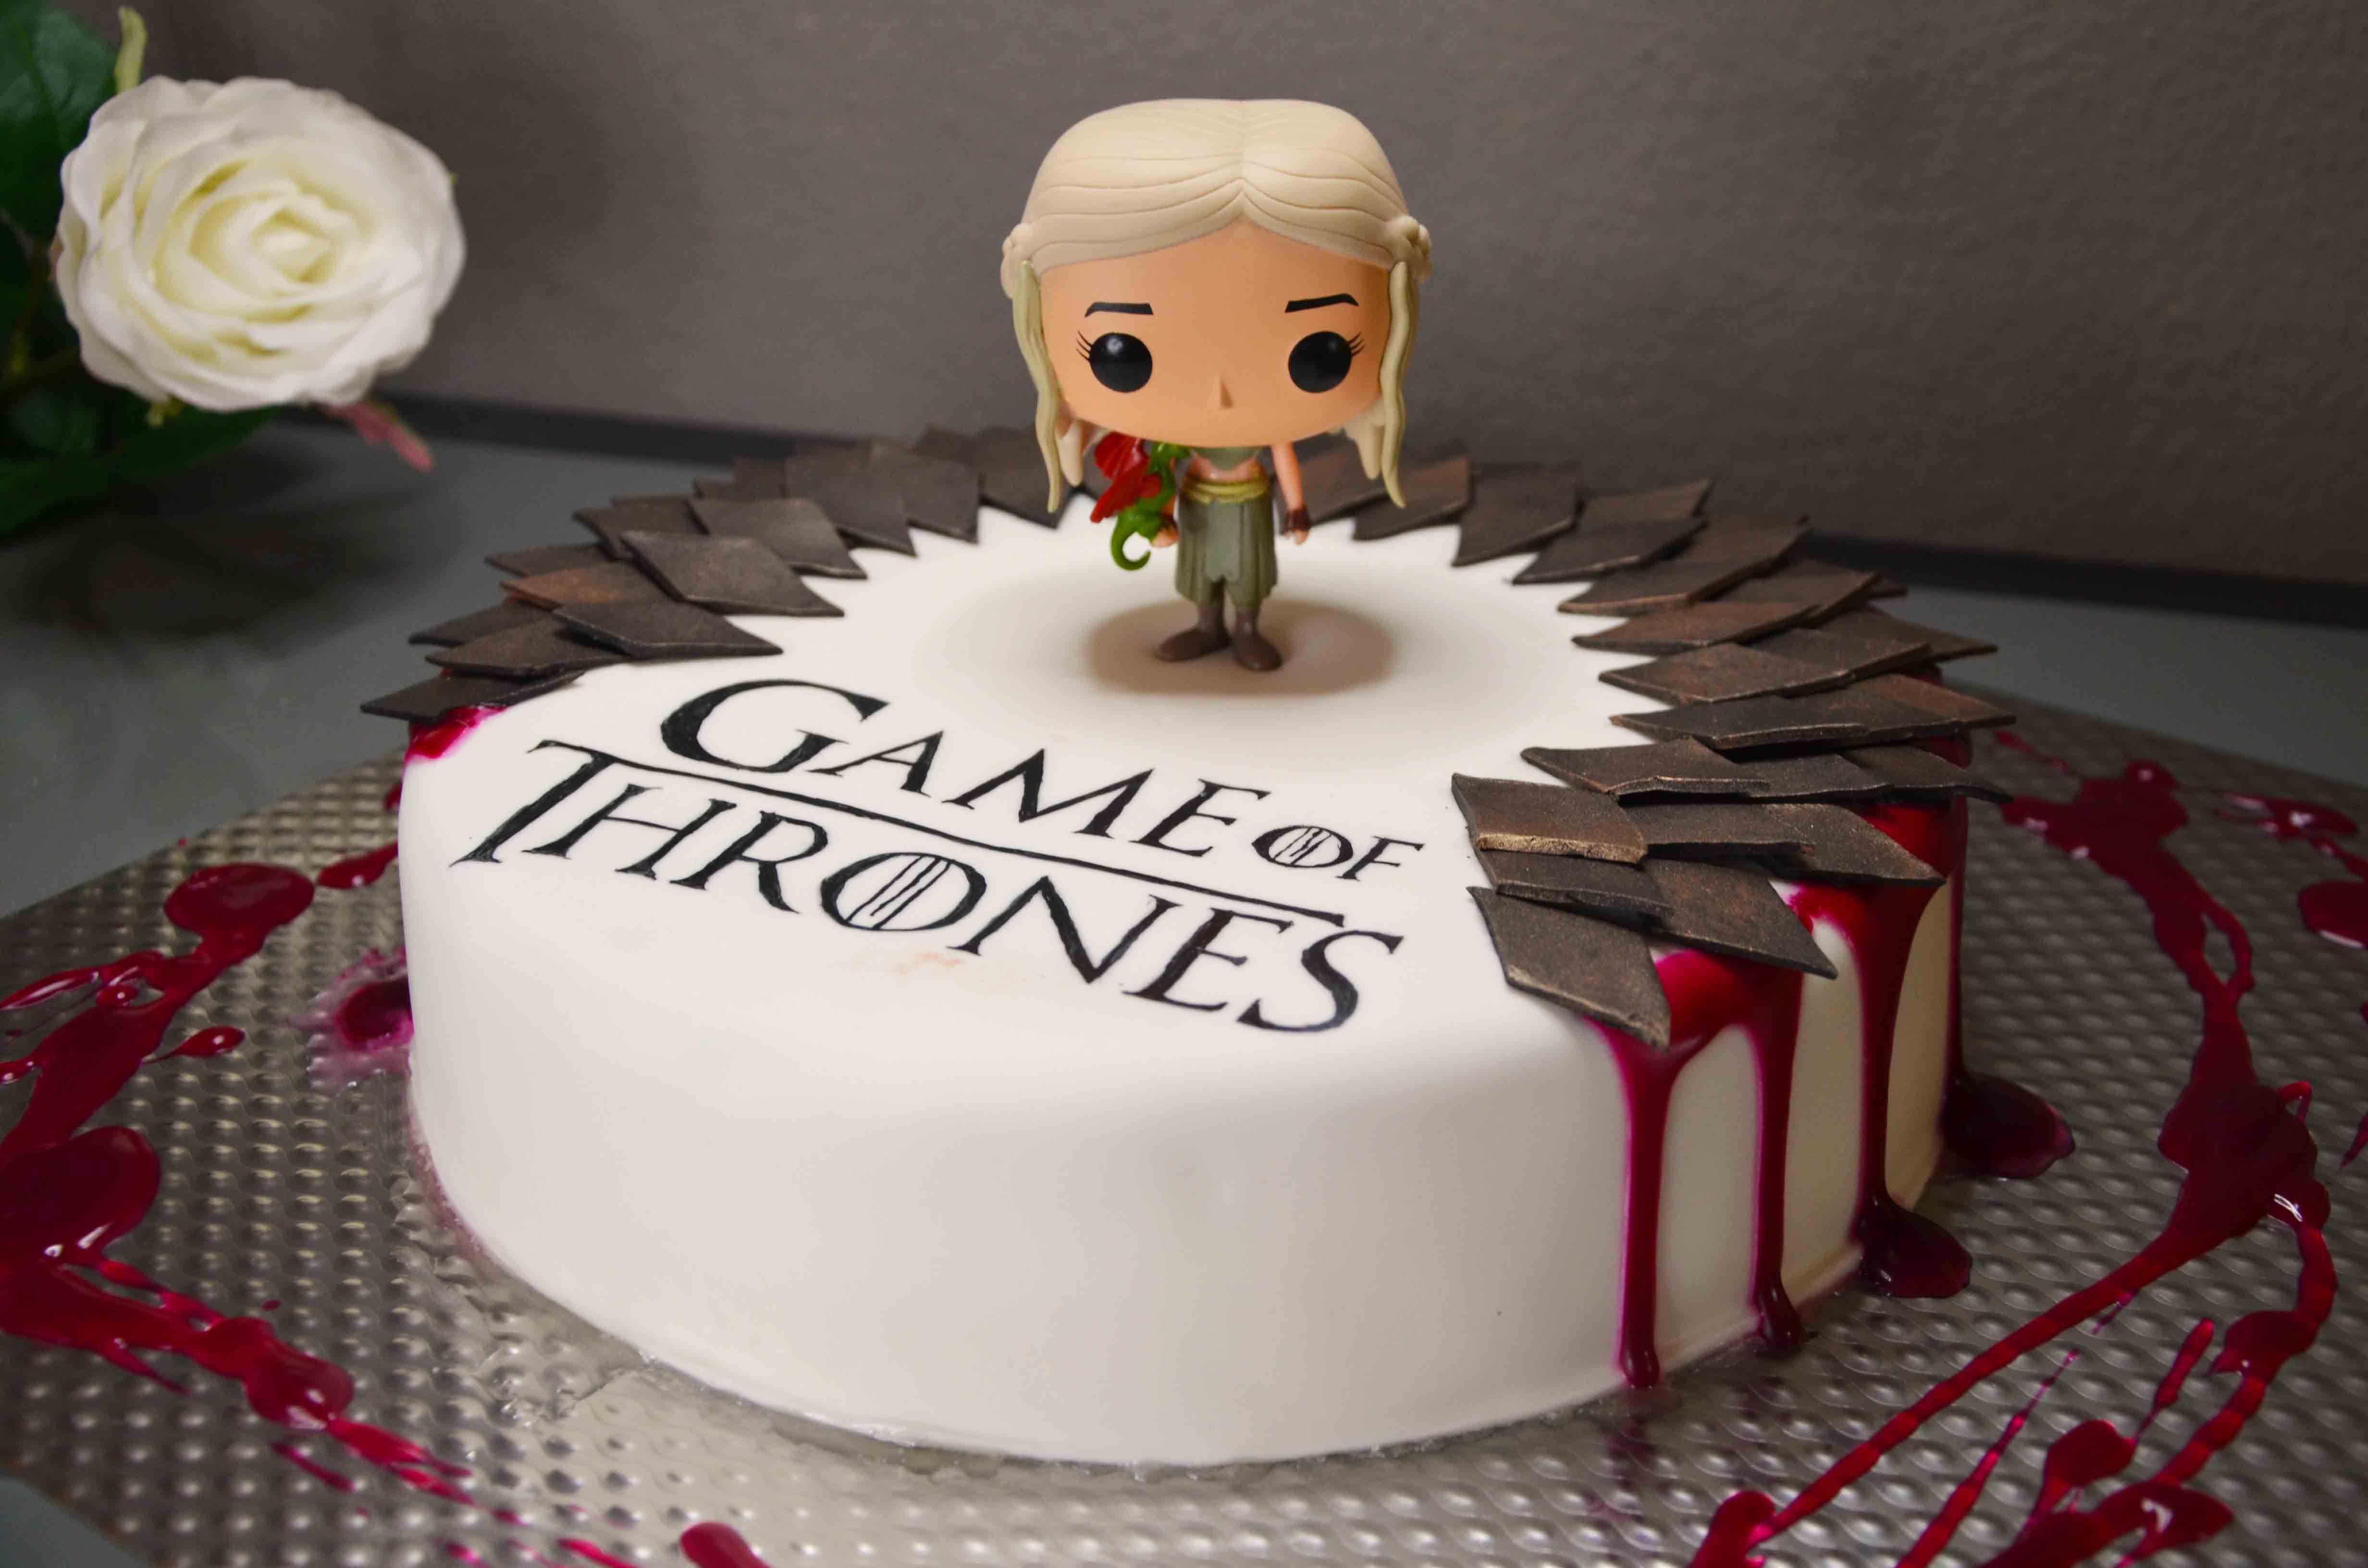 game of thrones birthday cake pop vinyl daenerys varios. Black Bedroom Furniture Sets. Home Design Ideas